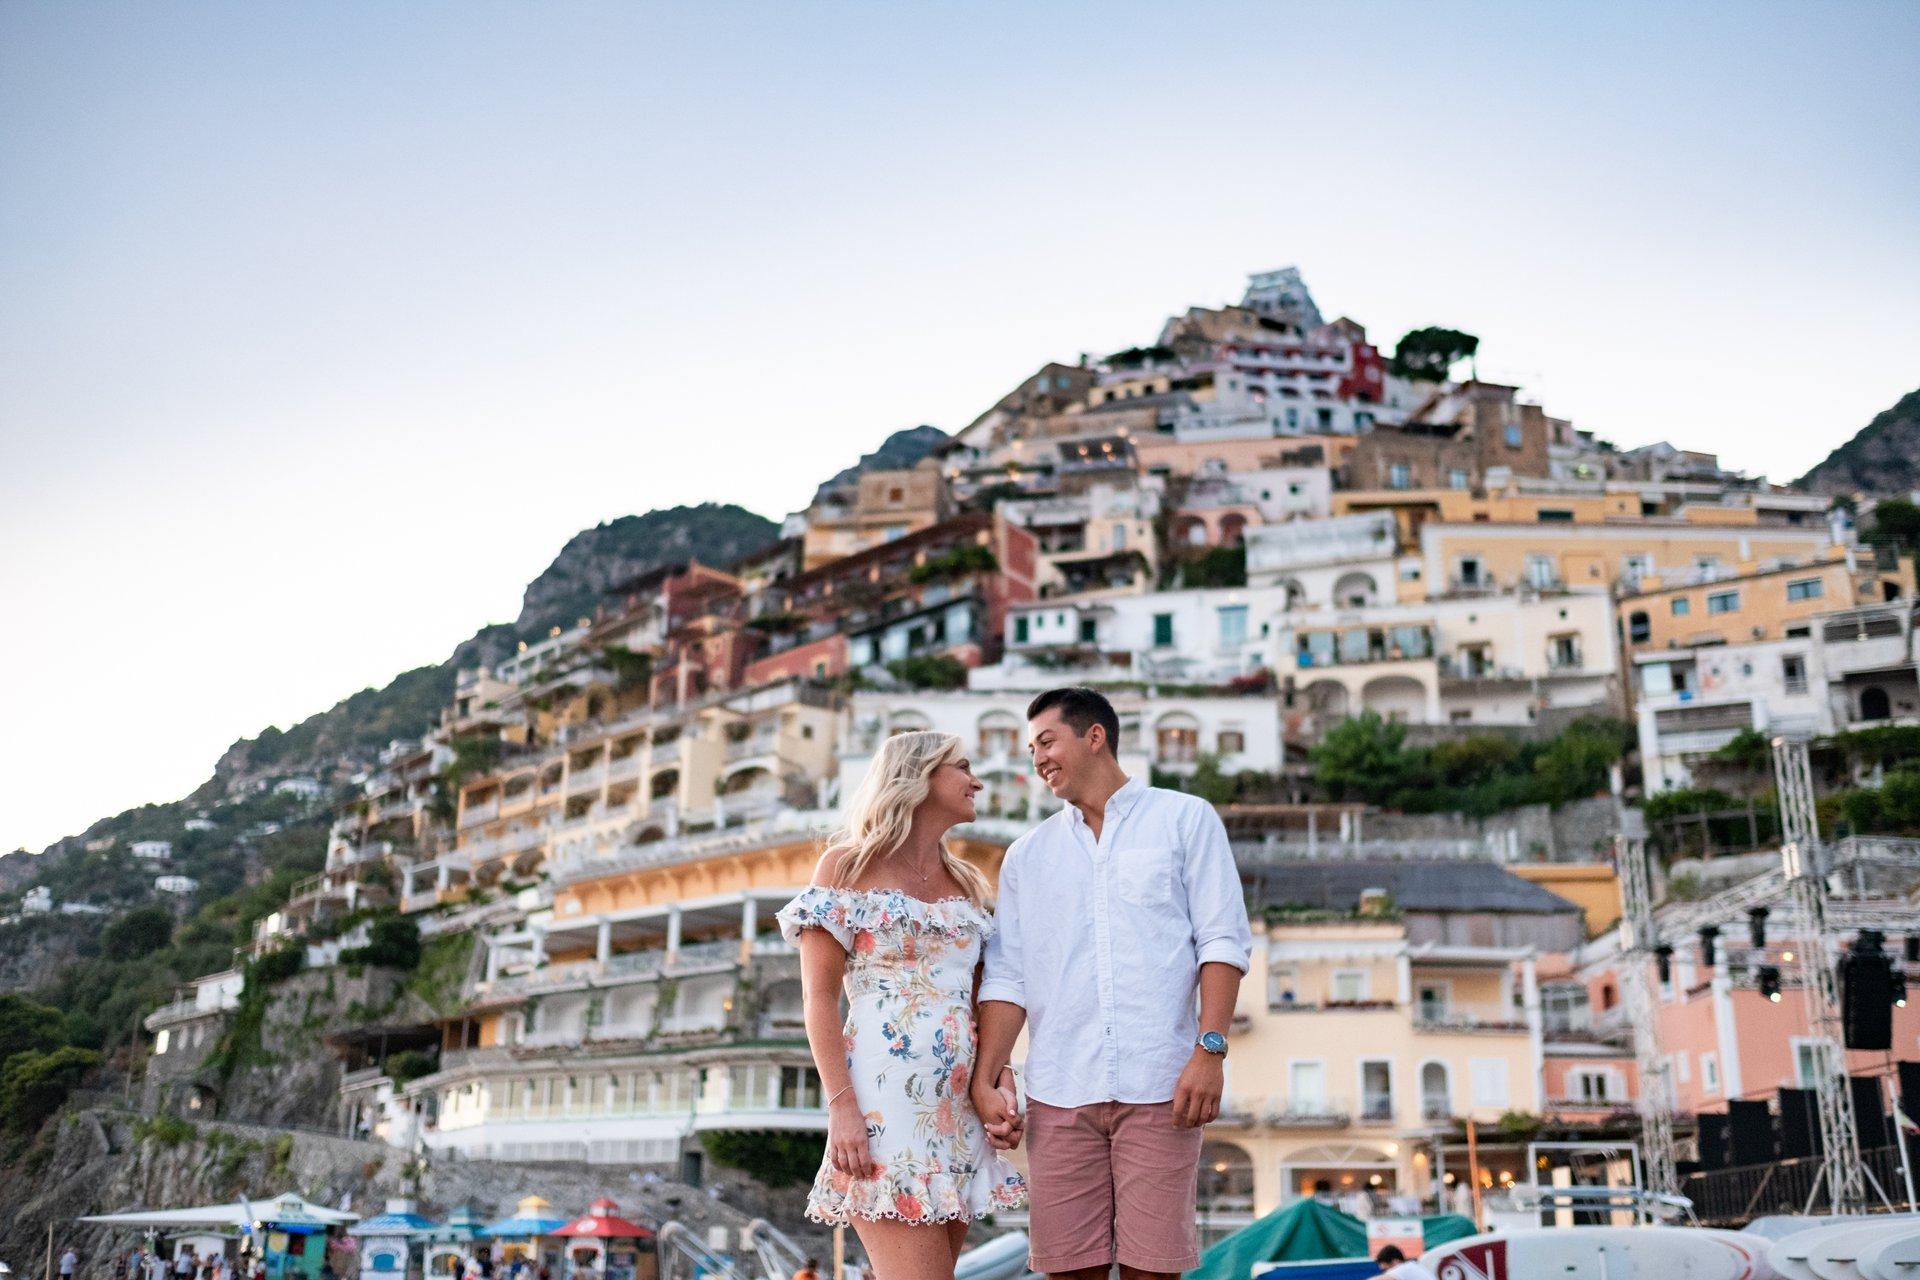 Positano-Italy-travel-story-Flytographer-3